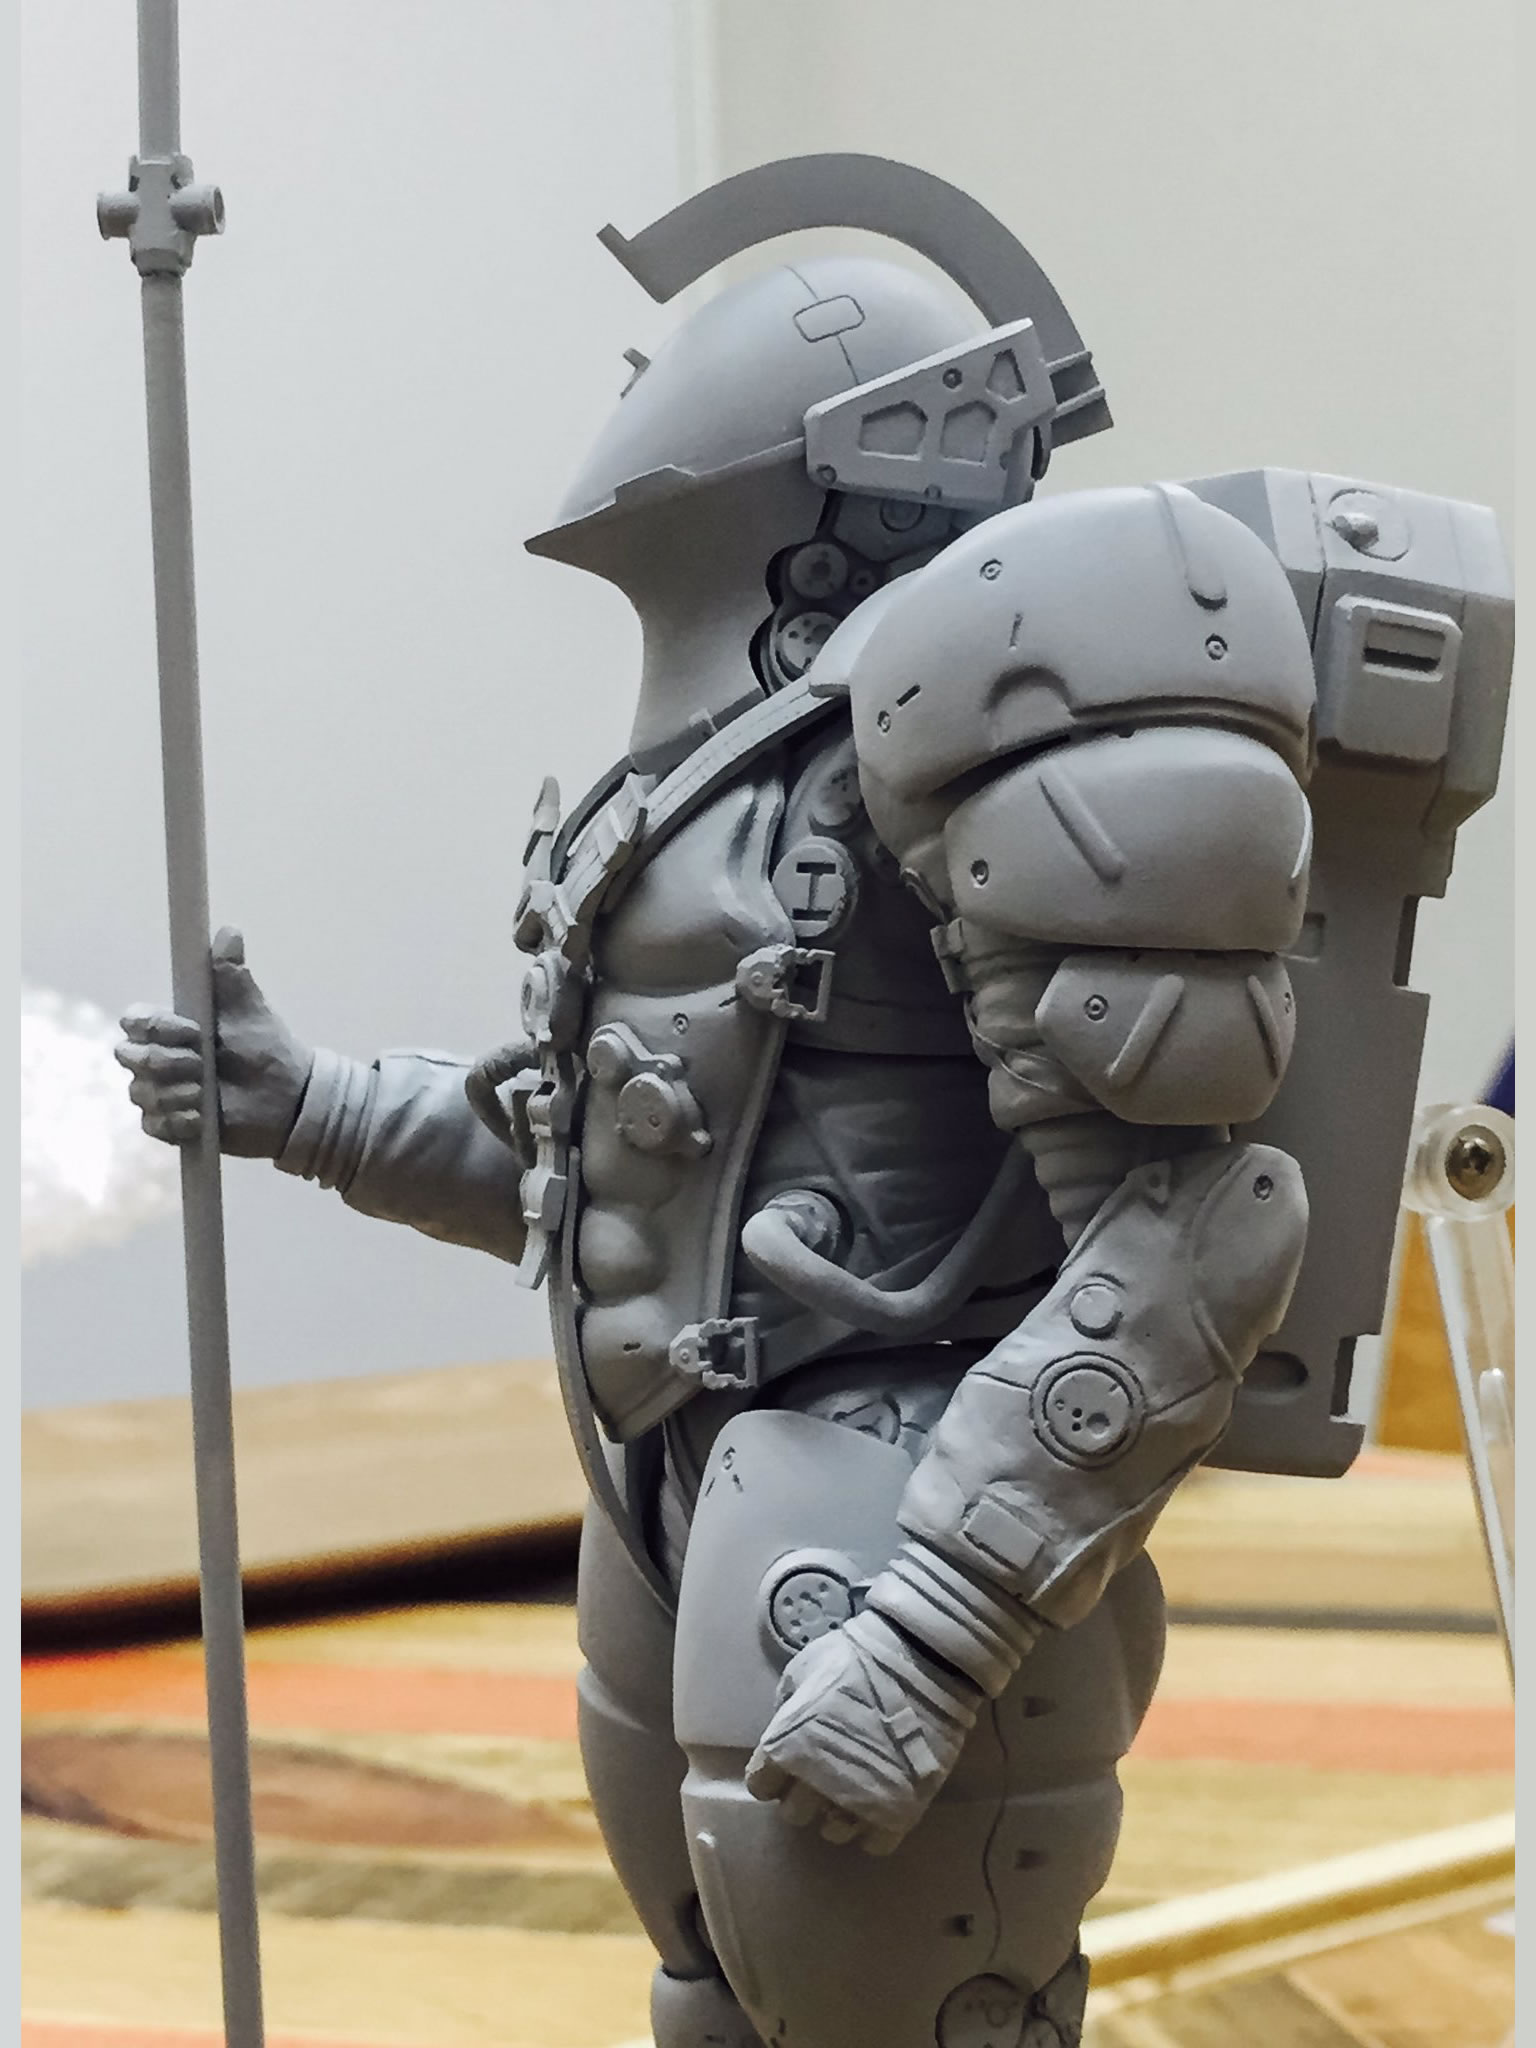 Figurine Figma de Ludens, la mascotte de Kojima Productions – 12 octobre 2016